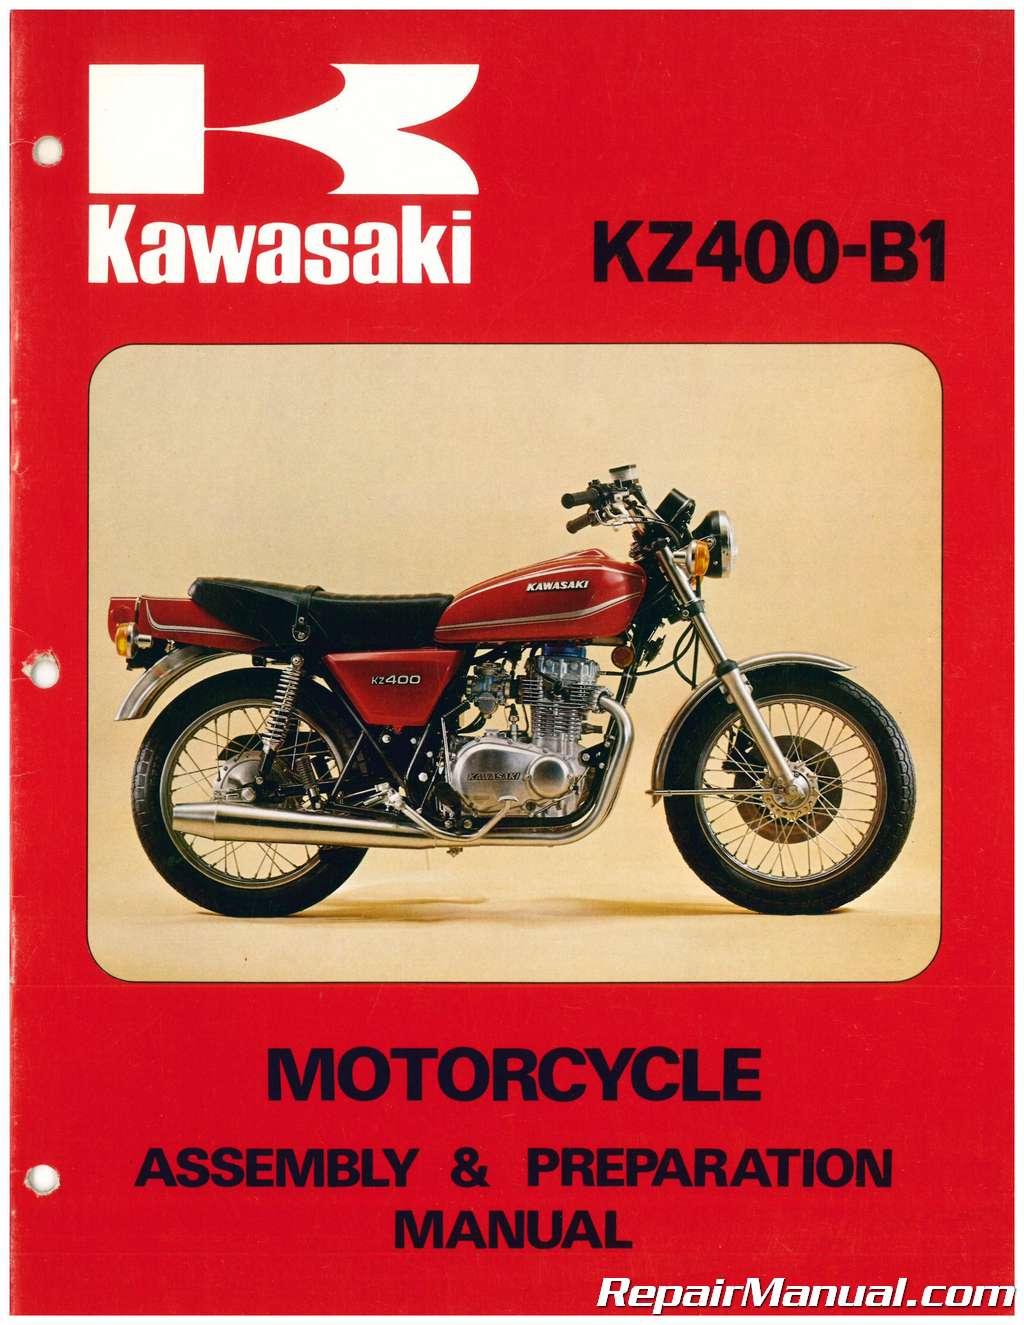 bmw motorcycle repair manual shop manual service manual c1 c1 200f650csf650gsk1100ltk1100rsk1100lt rsk1100rtr1100rsr8501100gsr8501100rk1200ltk1200rsr1100rt rs gs rr1100sr1150gsr1150rrtabsr80gs r100rr850cr1200c